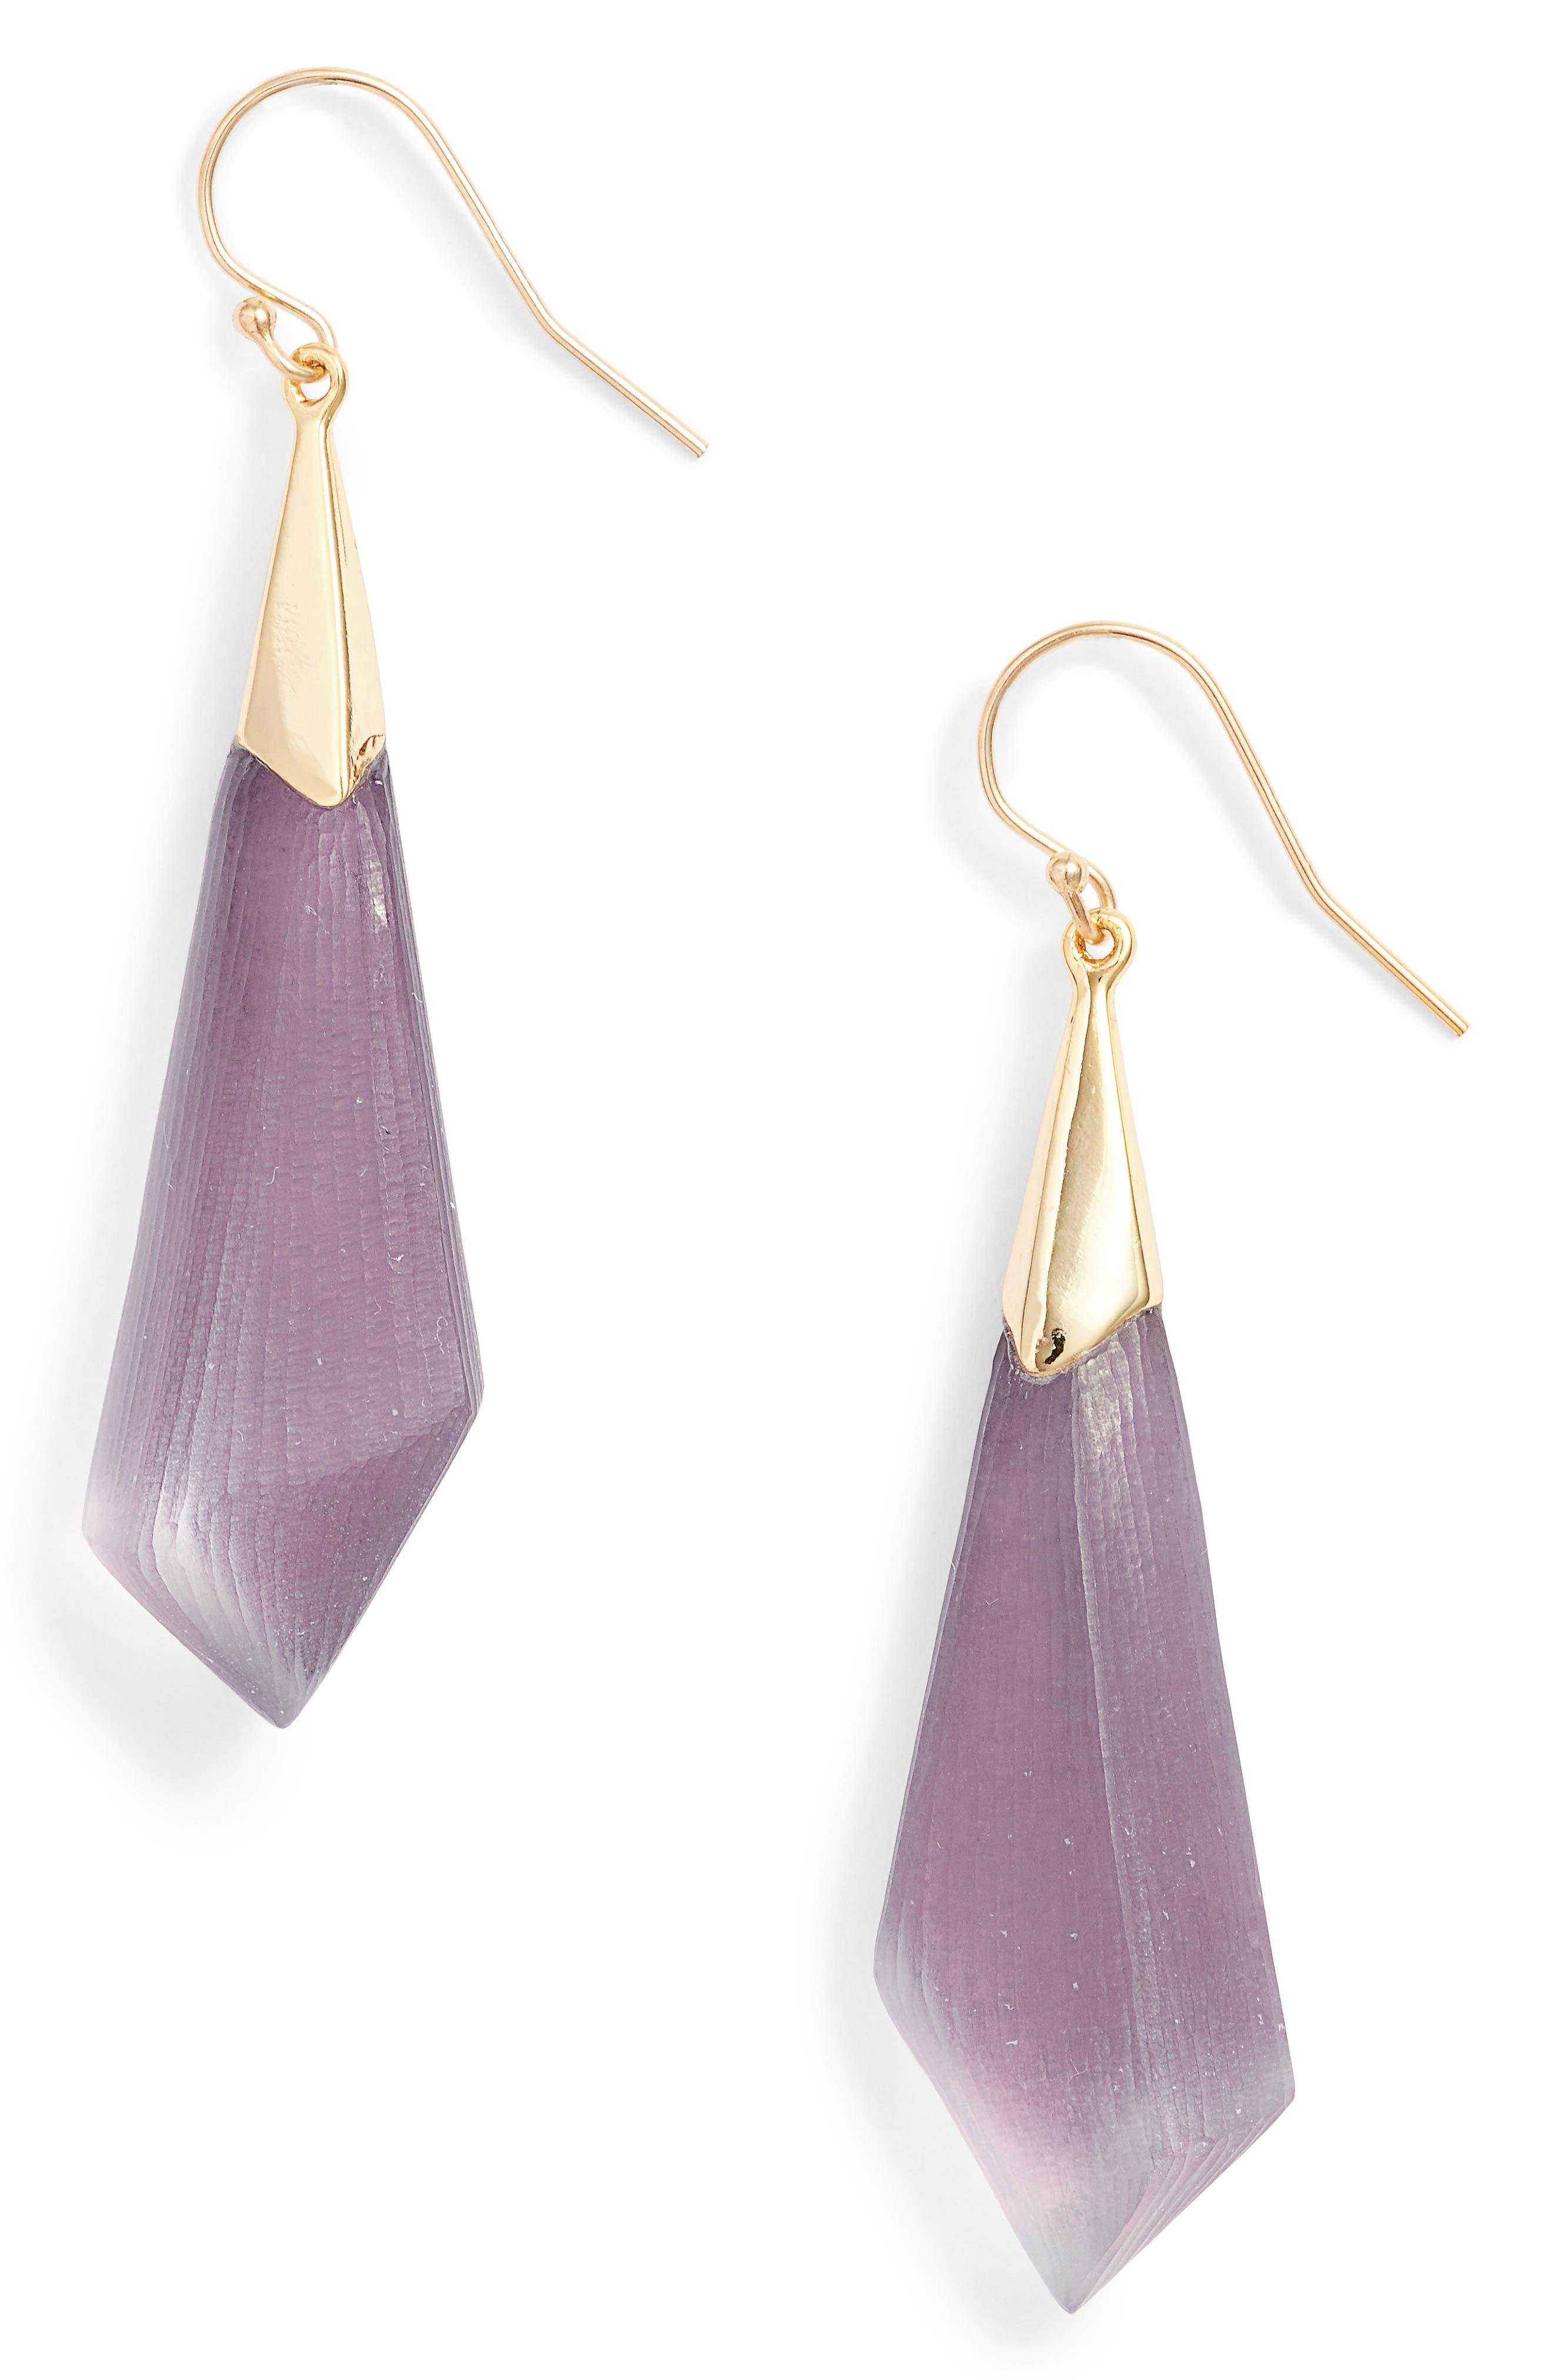 Alternate Image 1 Selected - Alexis Bittar Lucite® Drop Earrings